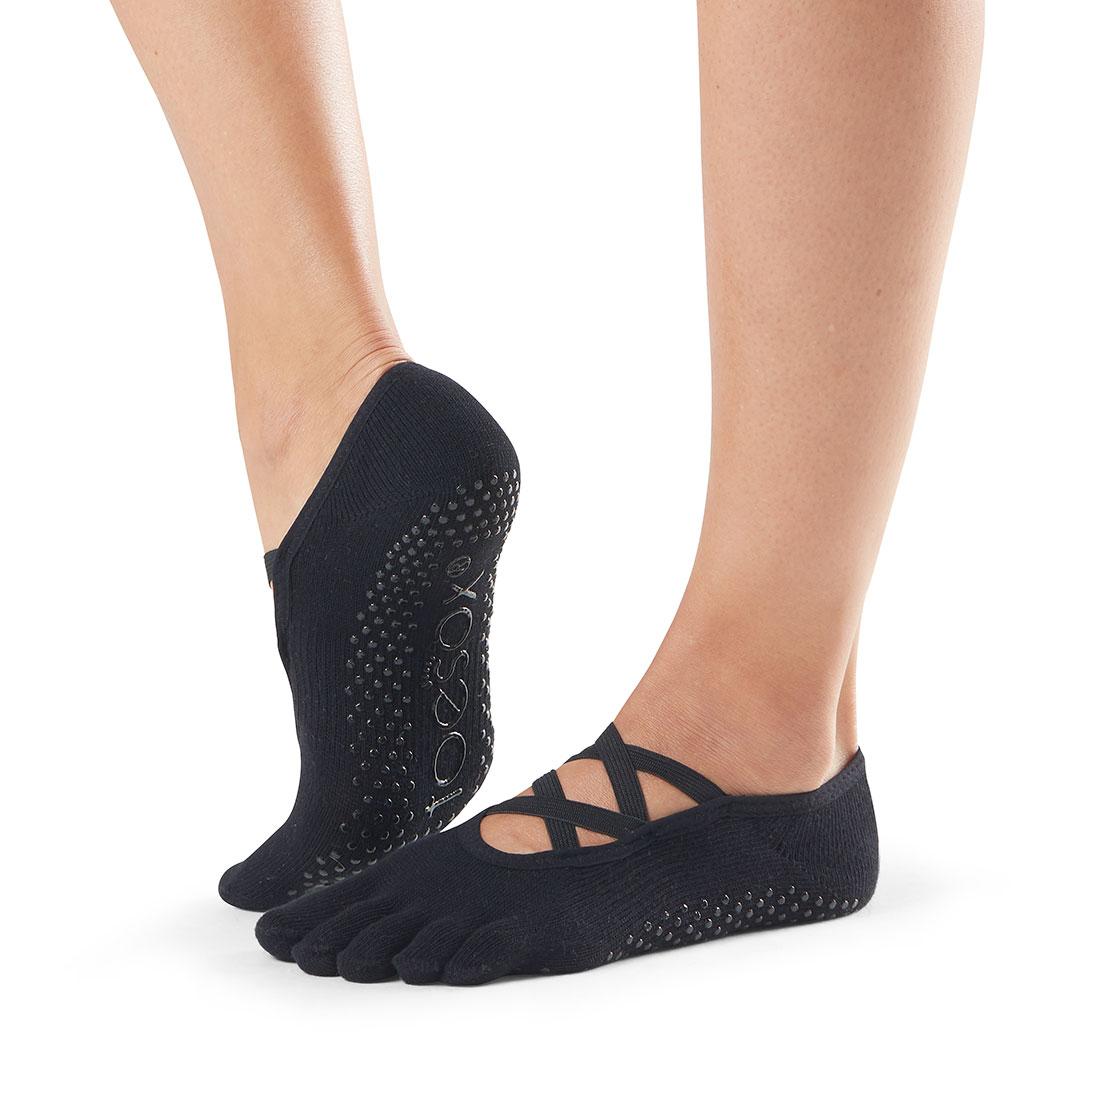 Yogasocken ToeSox Elle Full Toe Black